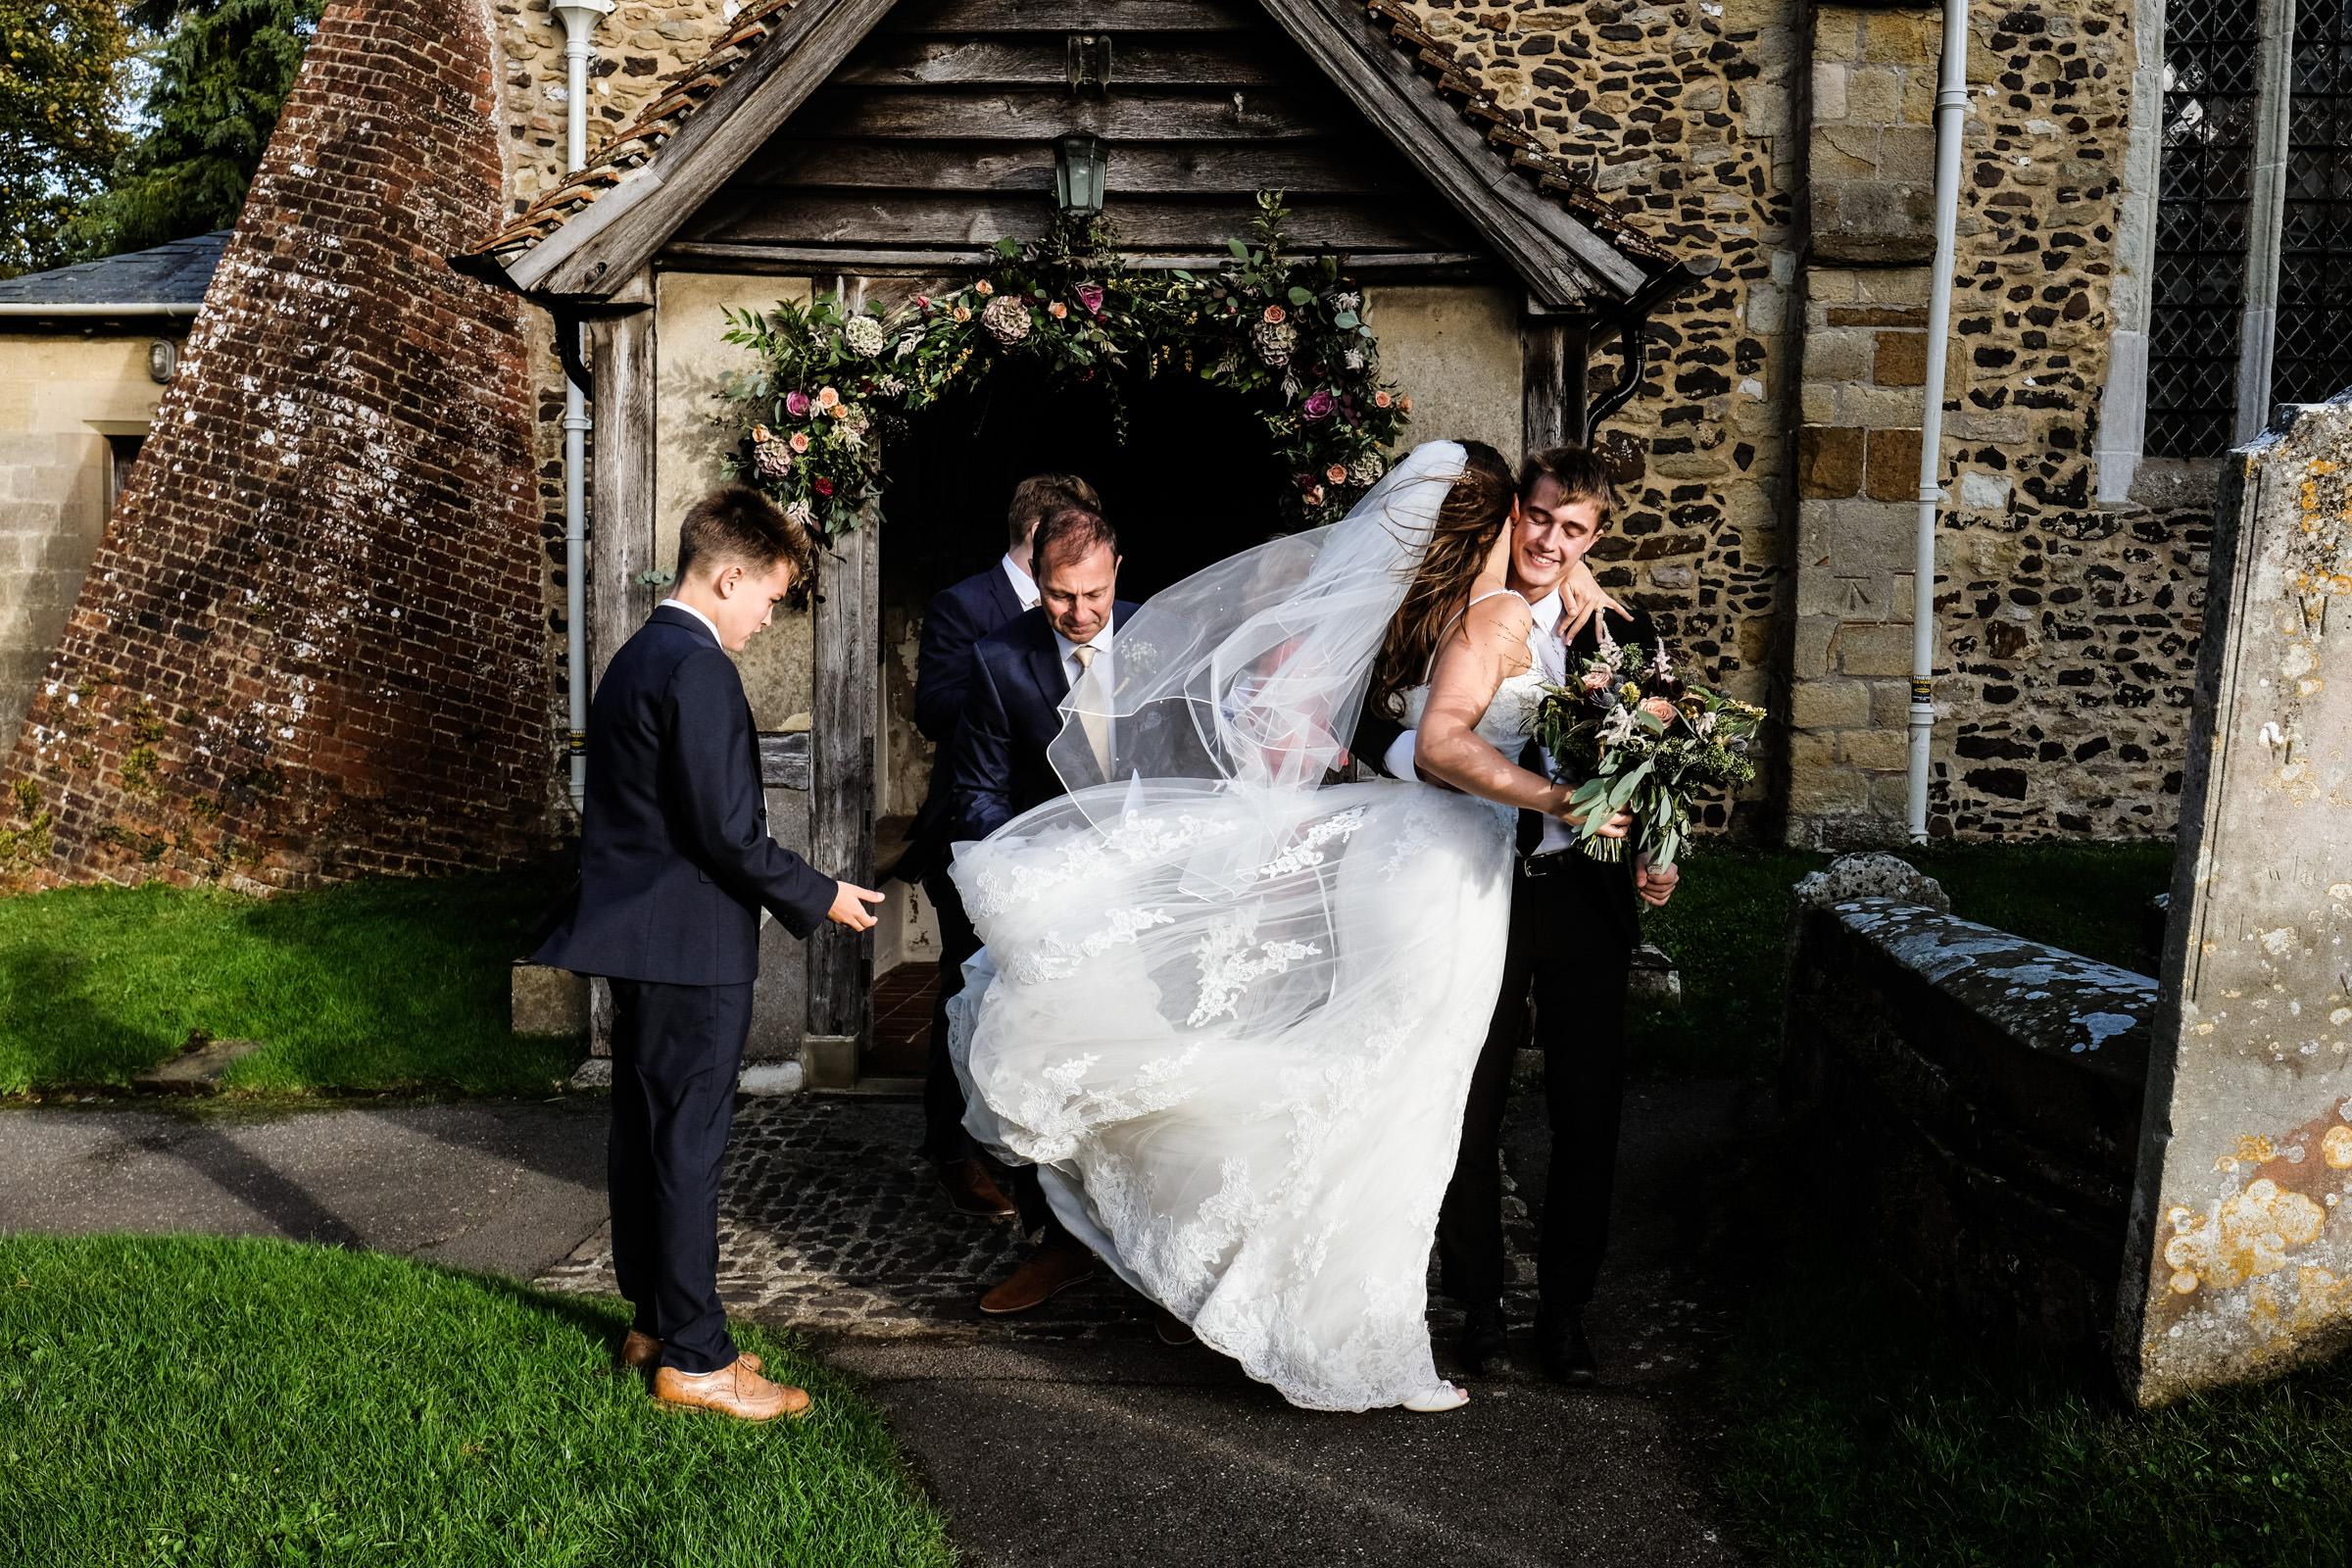 Talbot+Inn+Wedding+Photos+Surrey+022.jpg